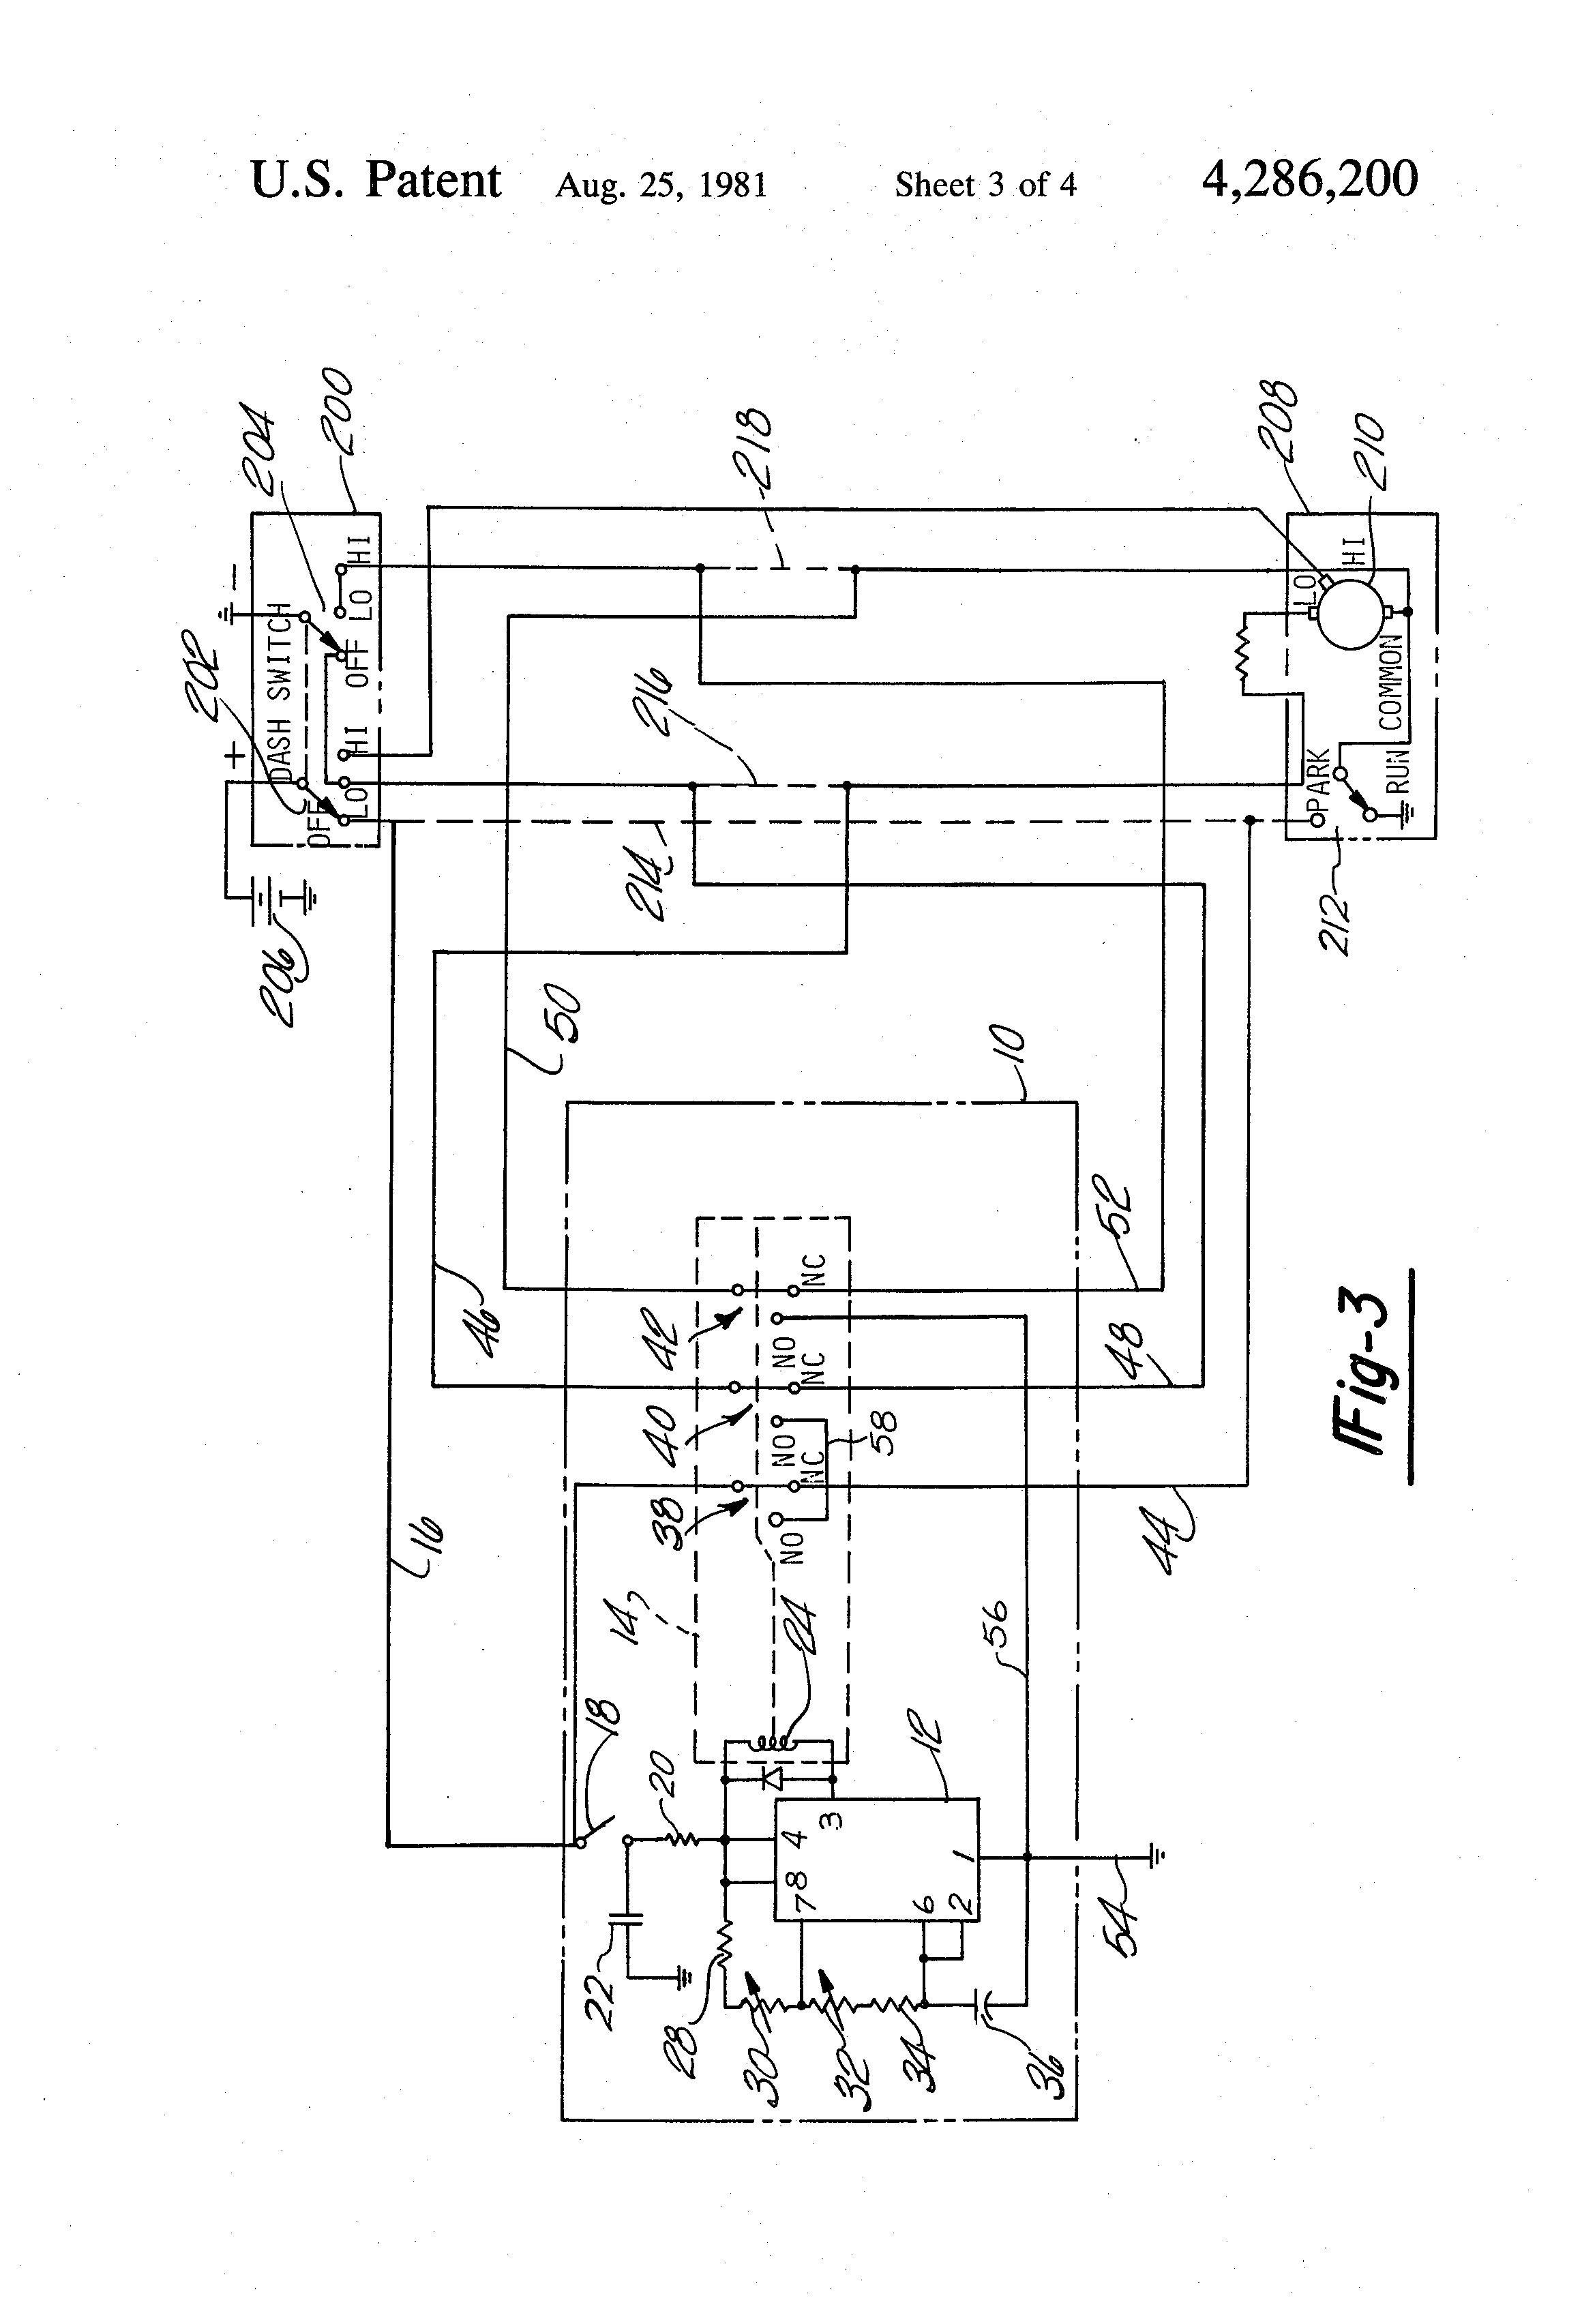 Painless Rocker Switch Wiring Diagram : Painless wiring rocker switch diagram nissan quest radio